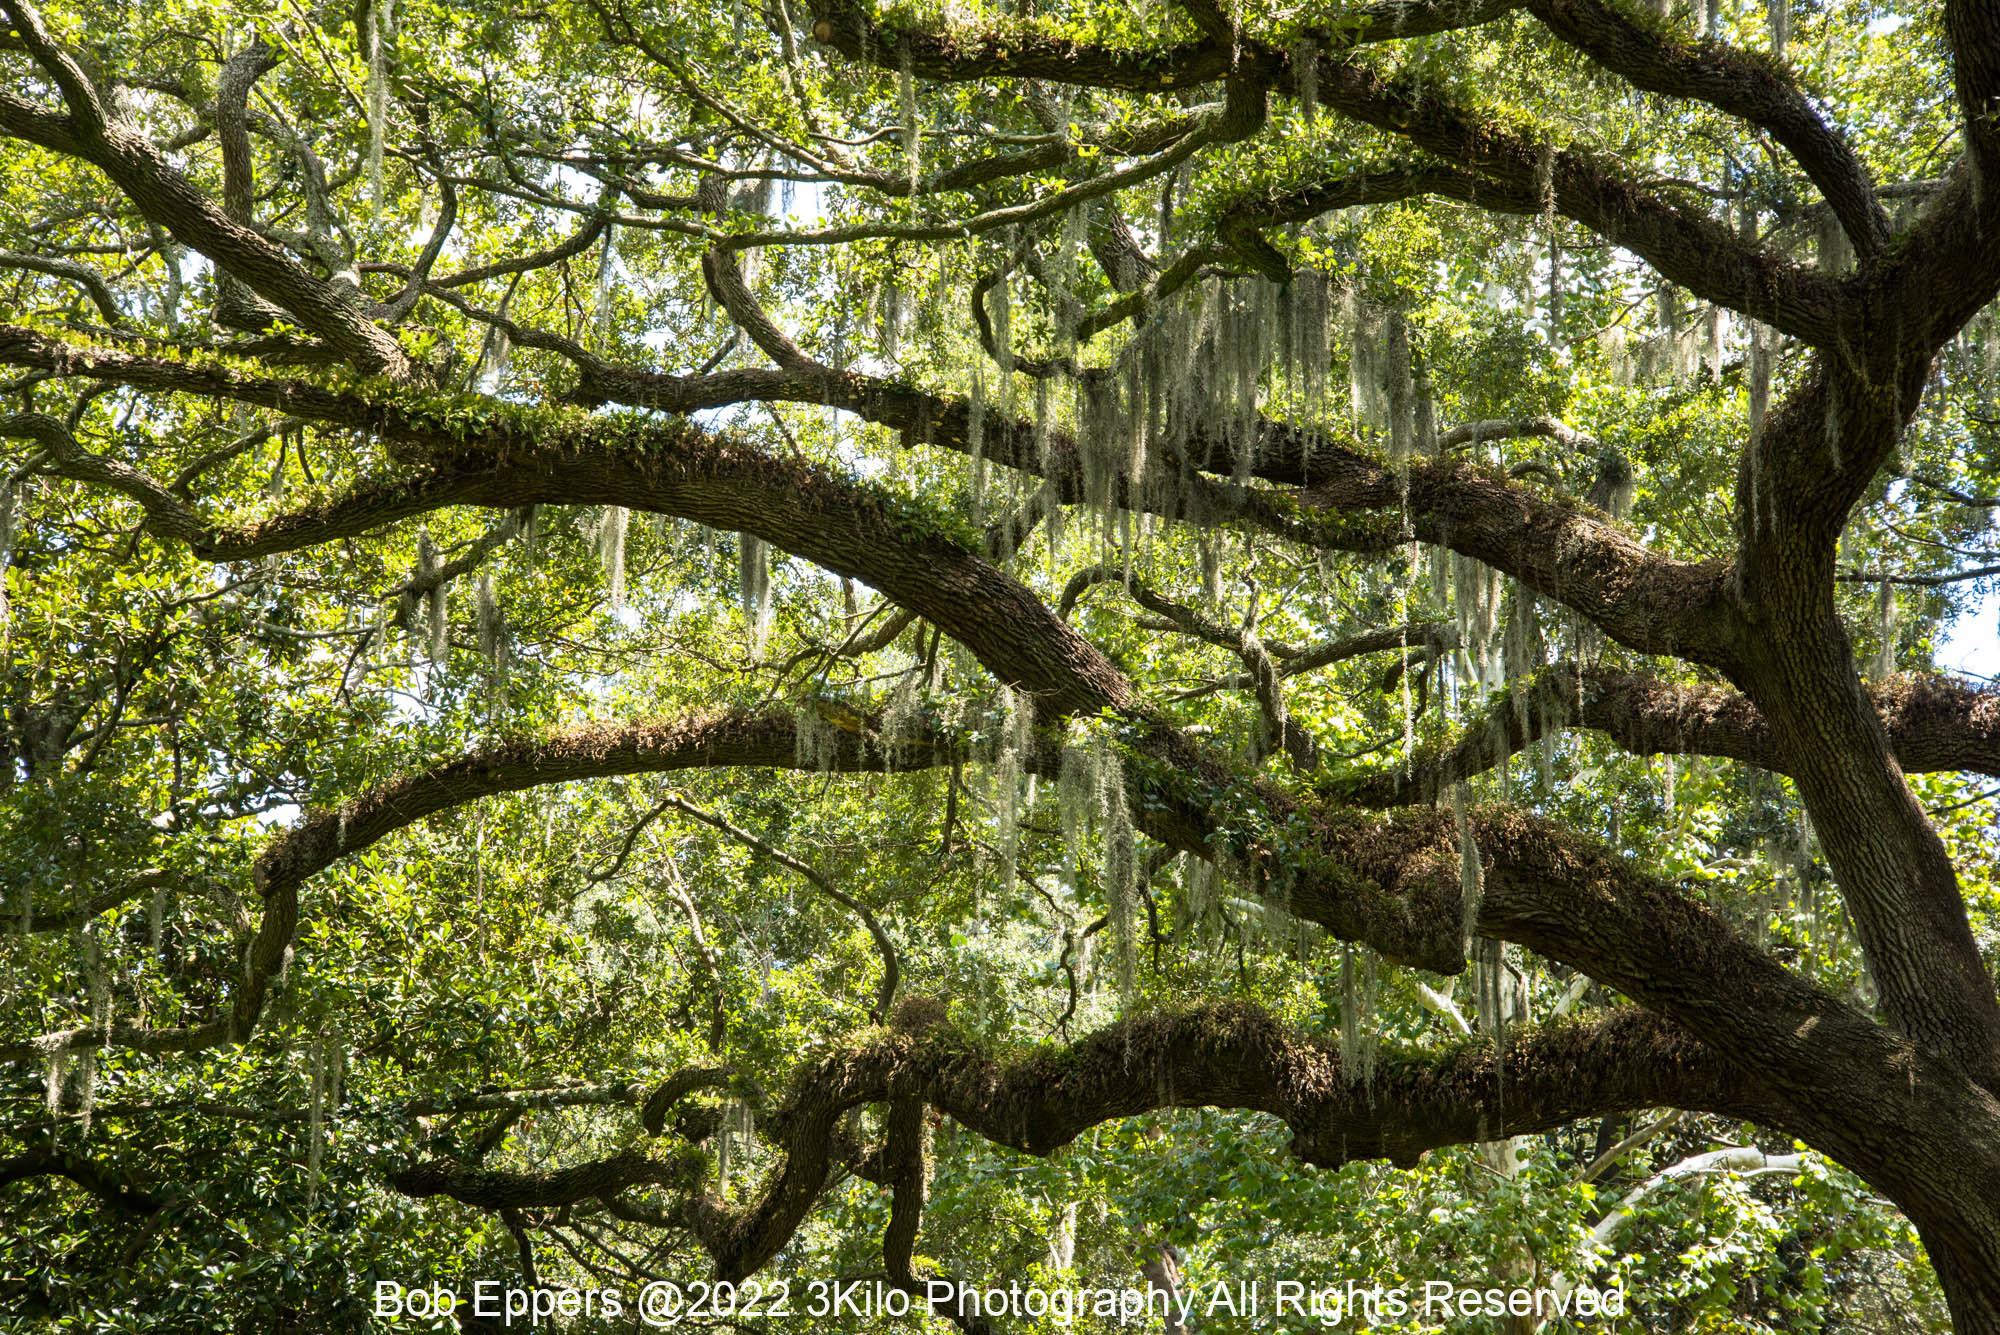 Photo of Spanish Moss and Oak Tree in Savannah, GA